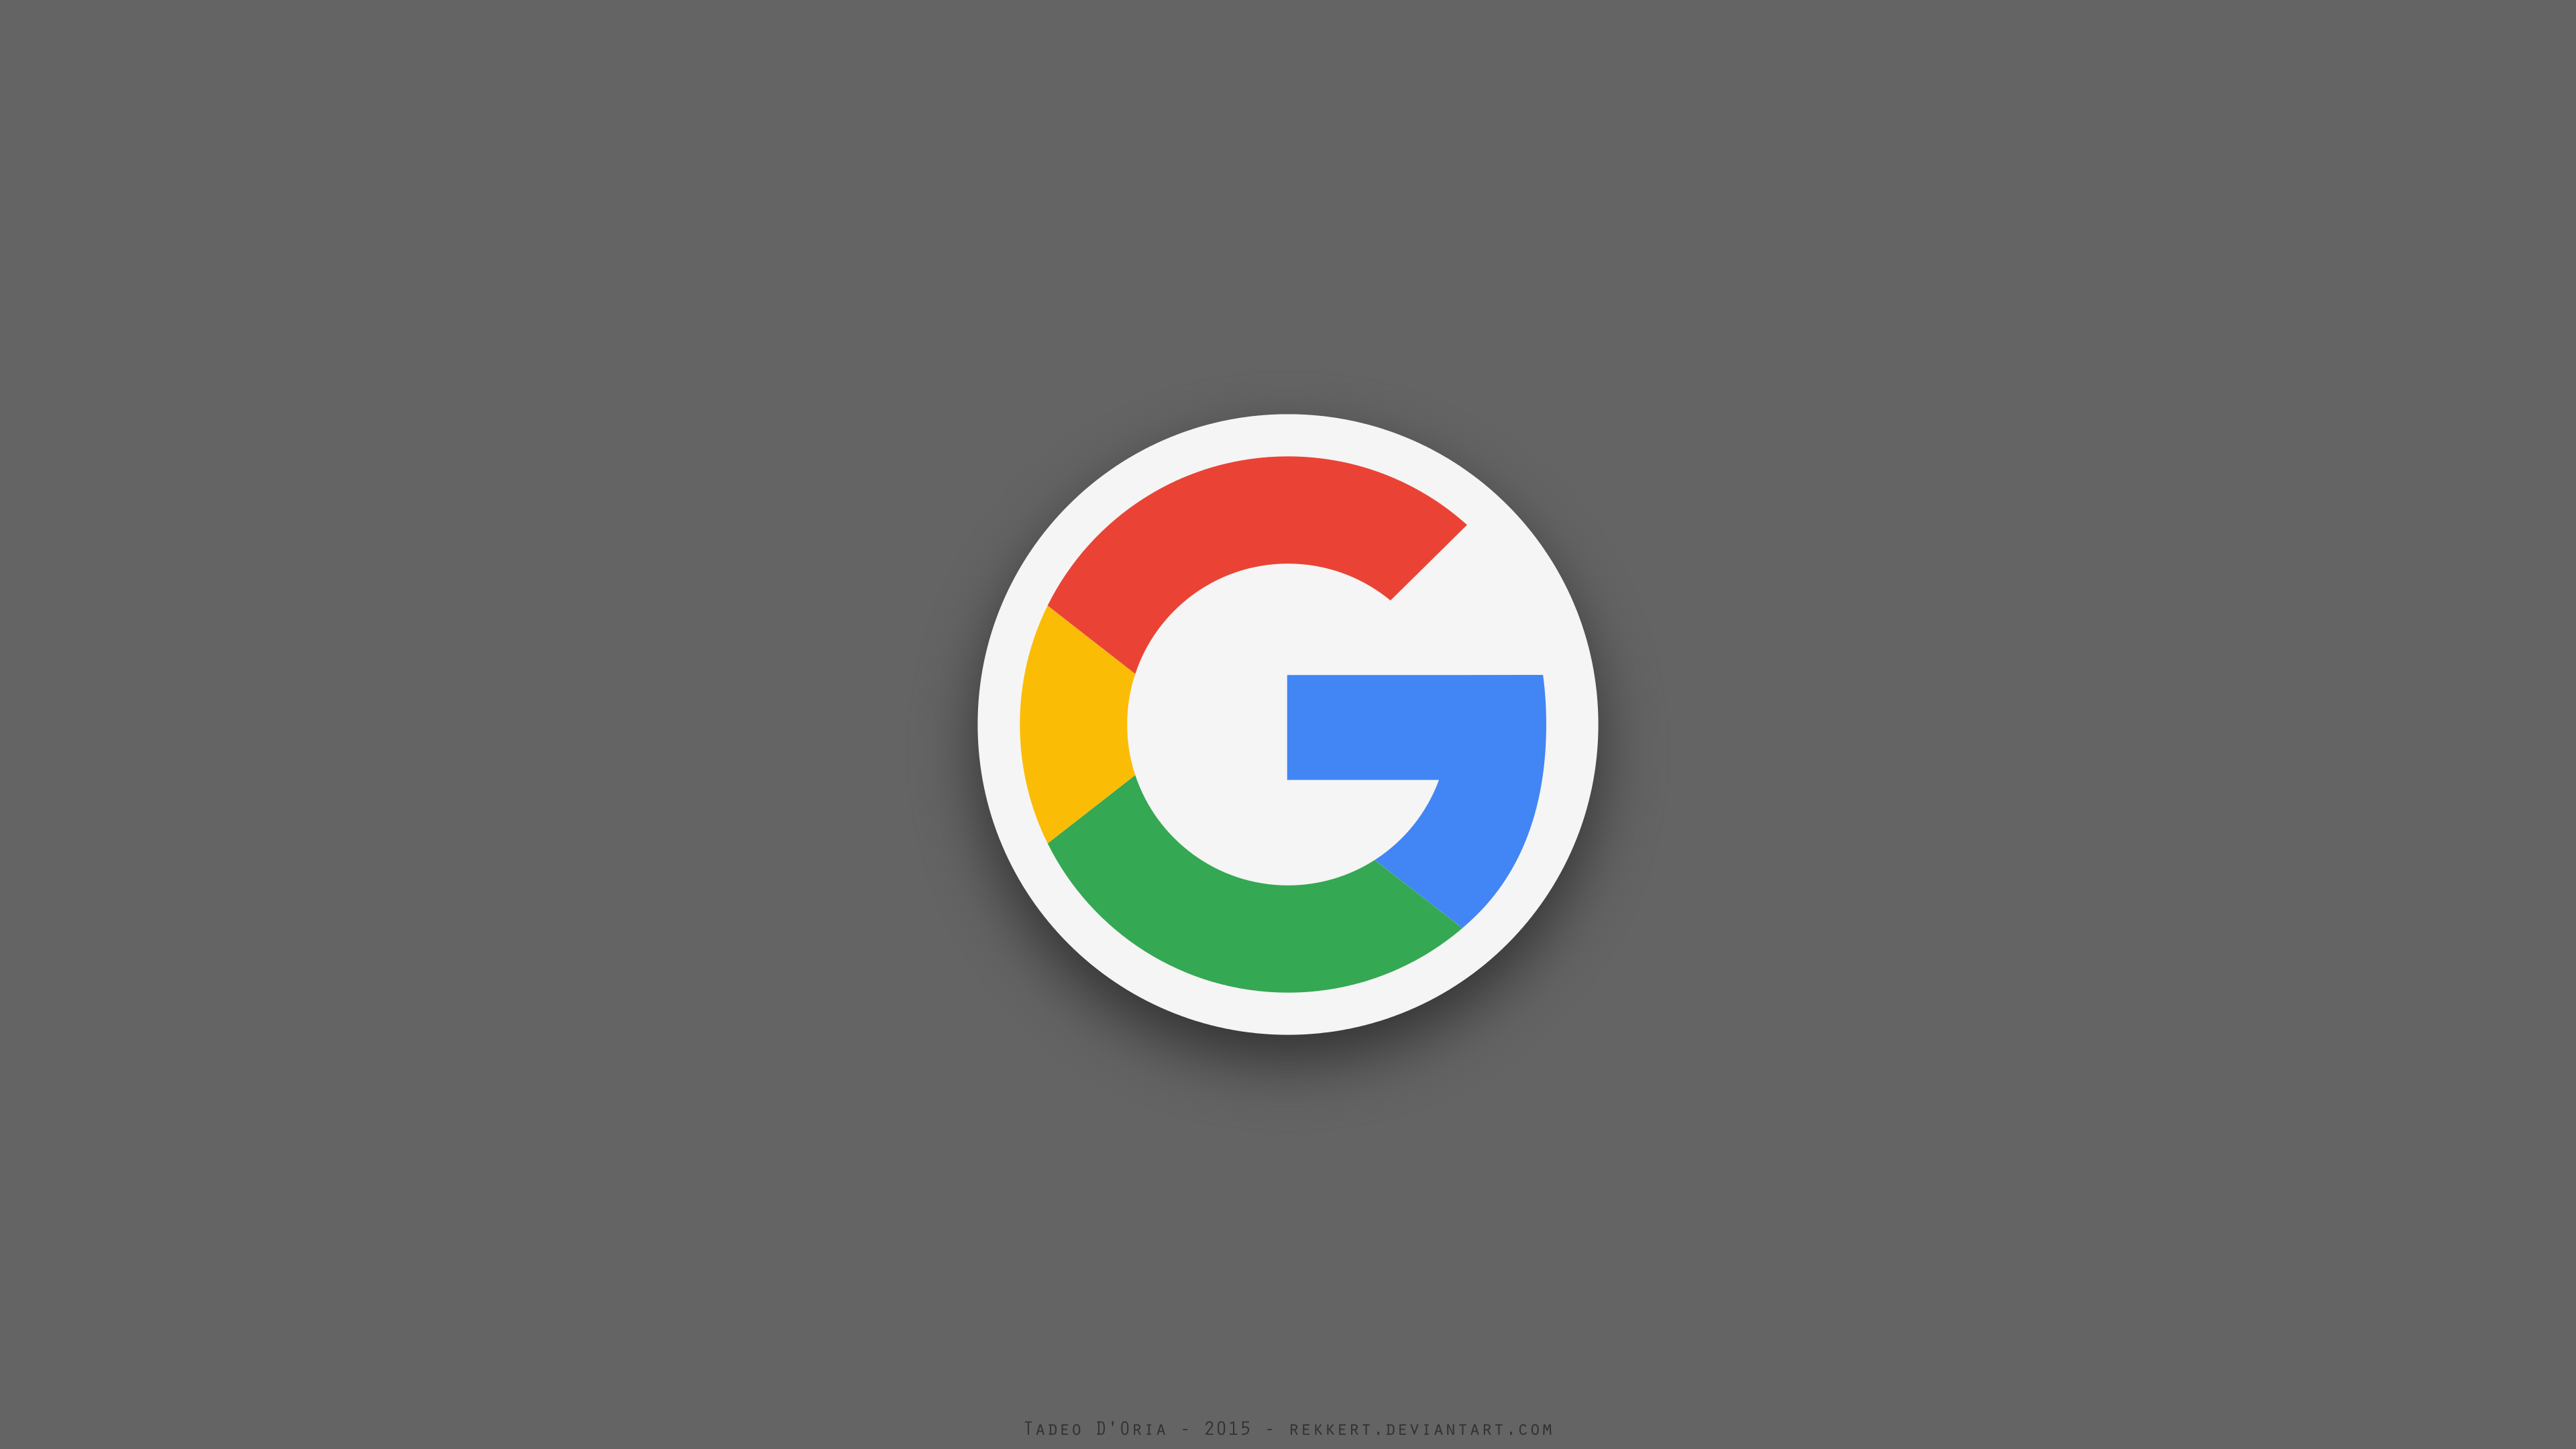 Google Wallpapers Hd Resolution Google Wallpaper Hd Google Pixel Wallpaper Google Logo